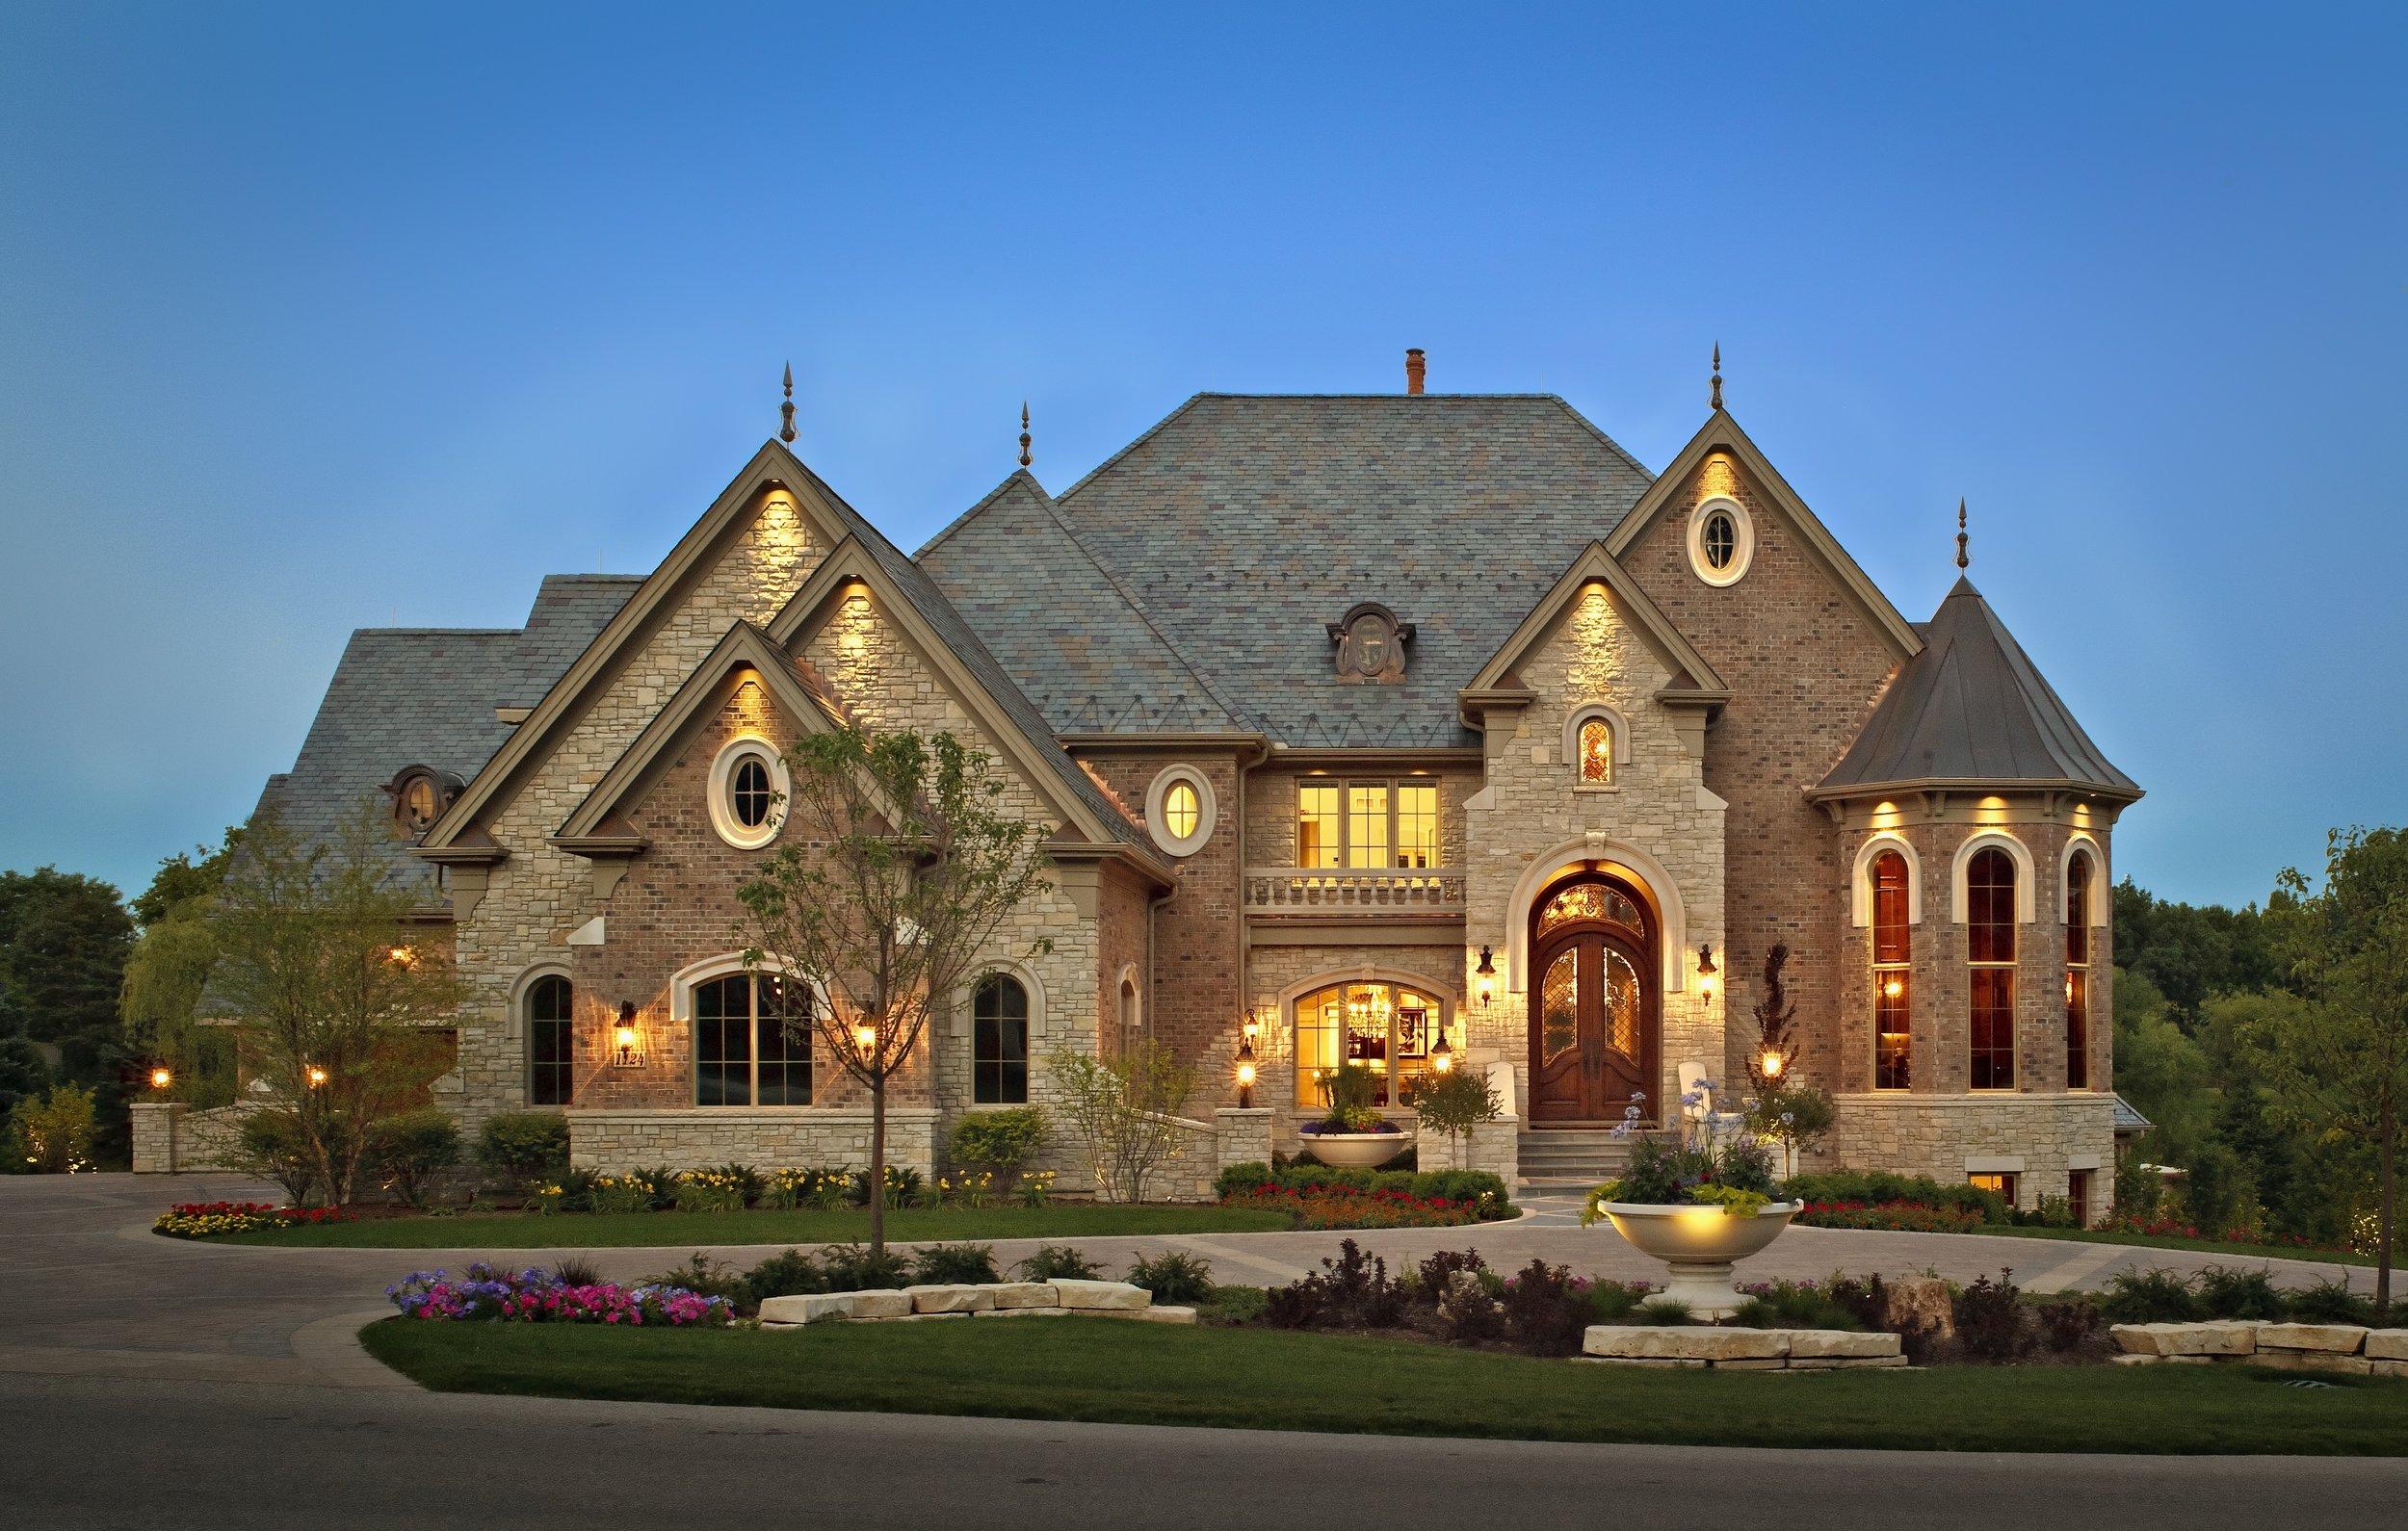 Custom Luxury Home in Geneva IL. 60134. Built by Southampton Builders LLC. Custom Turret & Limestone.